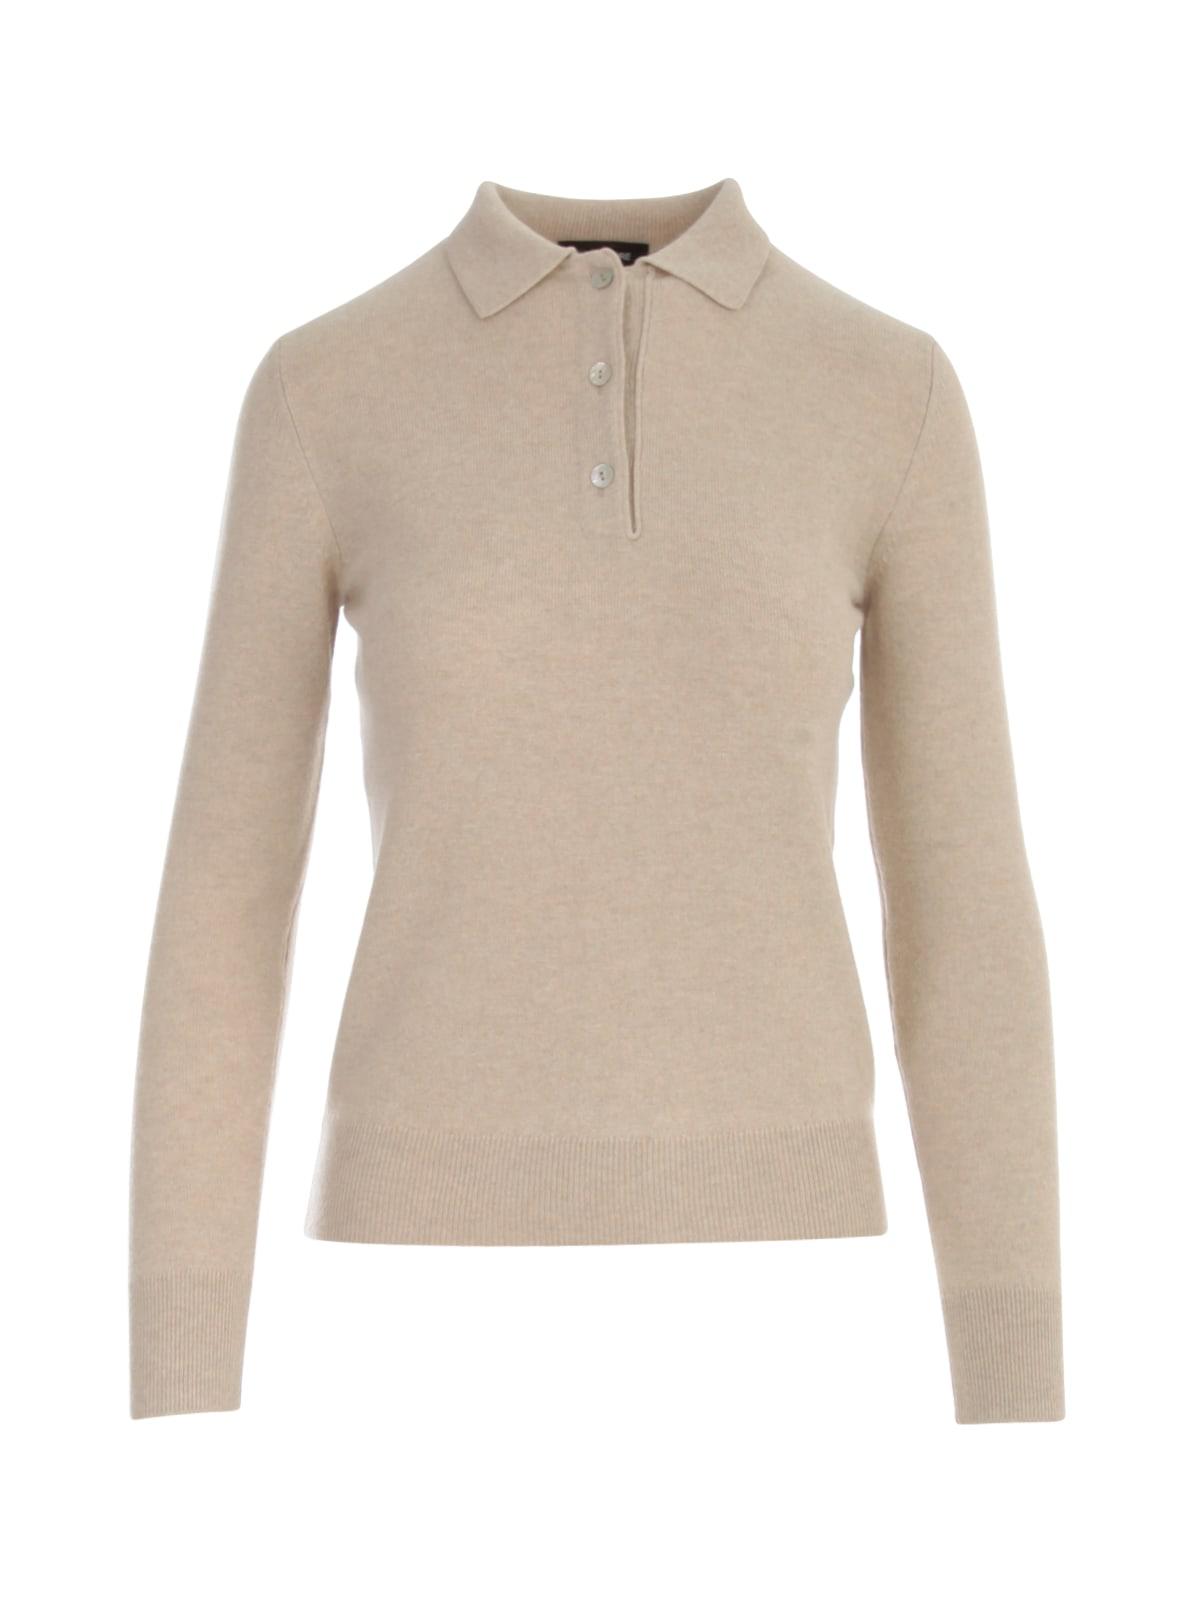 Polo Neck L/s Sweater